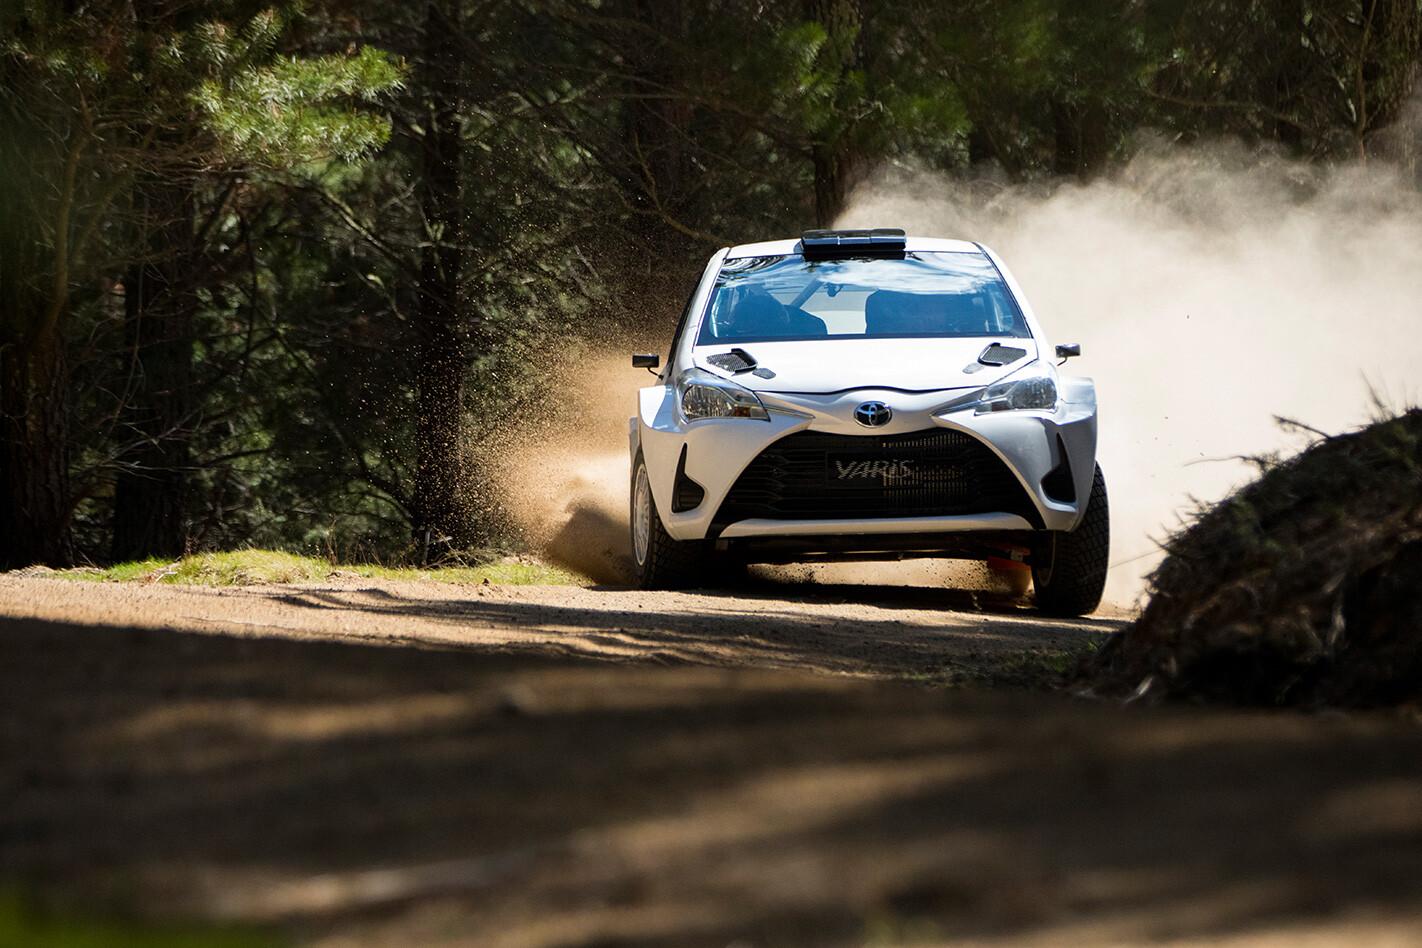 Toyota Yaris AP4 rally car offroading